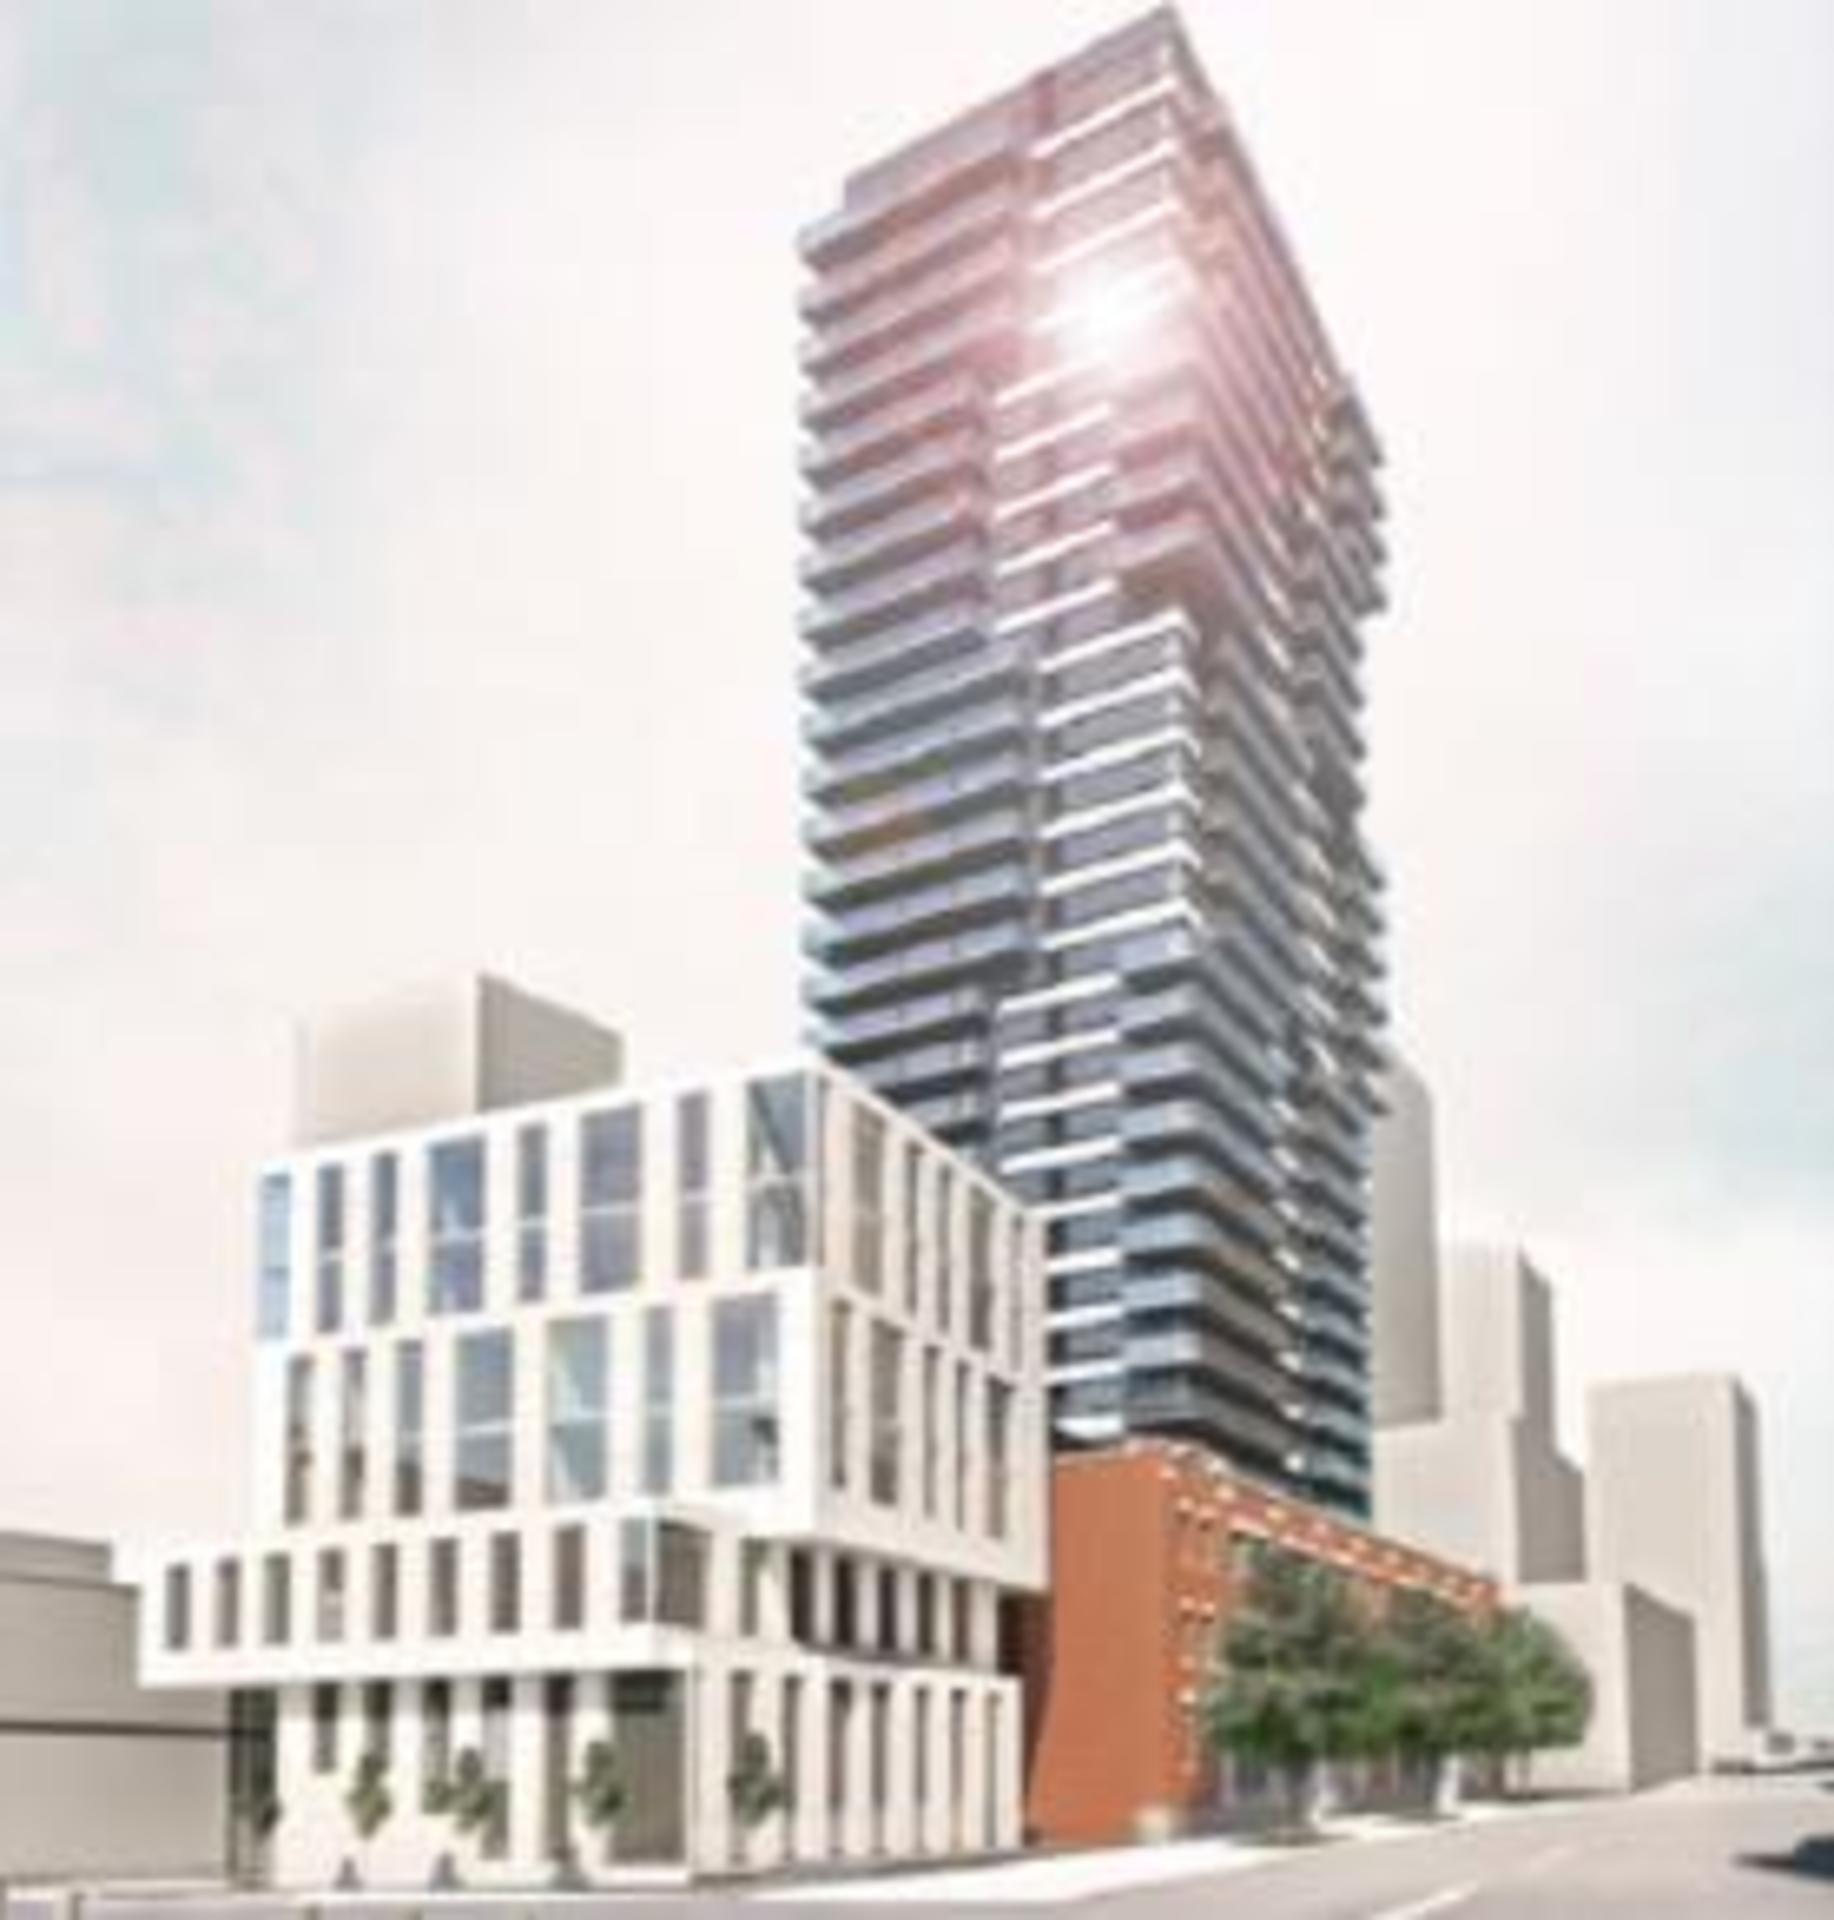 118-150-robson-st-rendering-2 at BLOCK (118-150 Robson Street, Yaletown, Vancouver West)